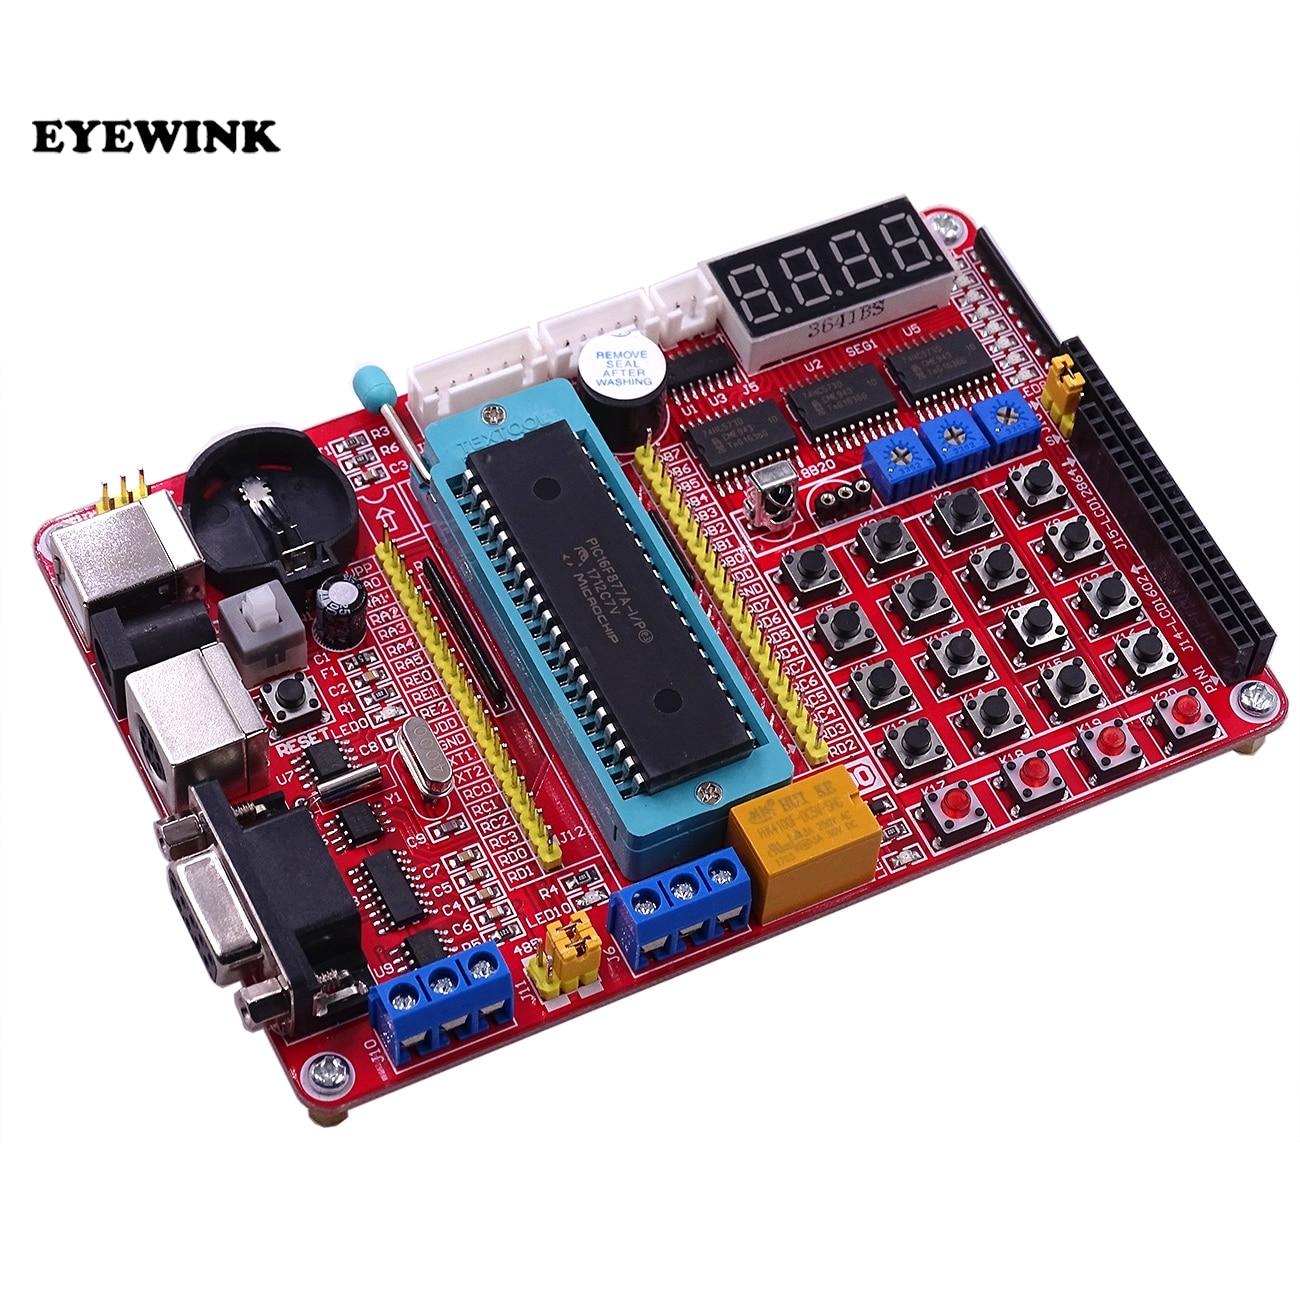 EYEWINK PIC MCU development Mini System PIC Development Board + микрочип PIC16F877A + USB кабель